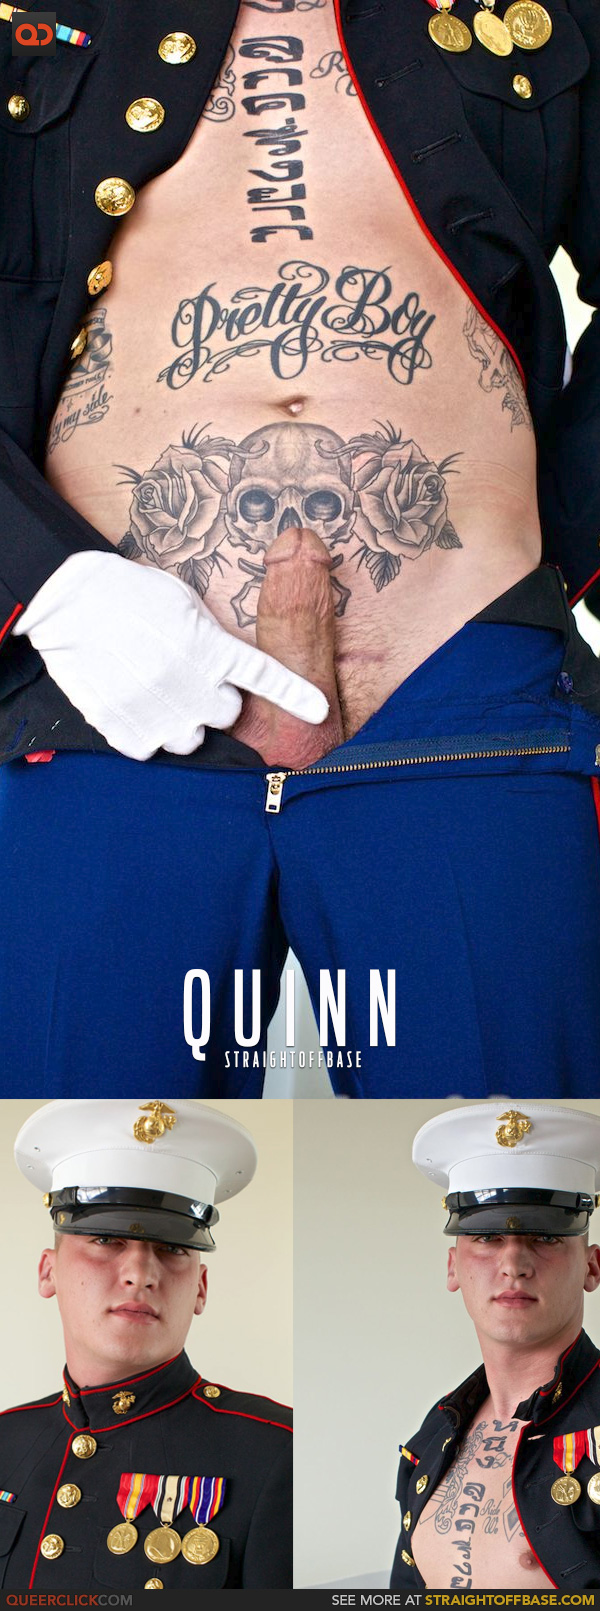 straightoffbase-quinn